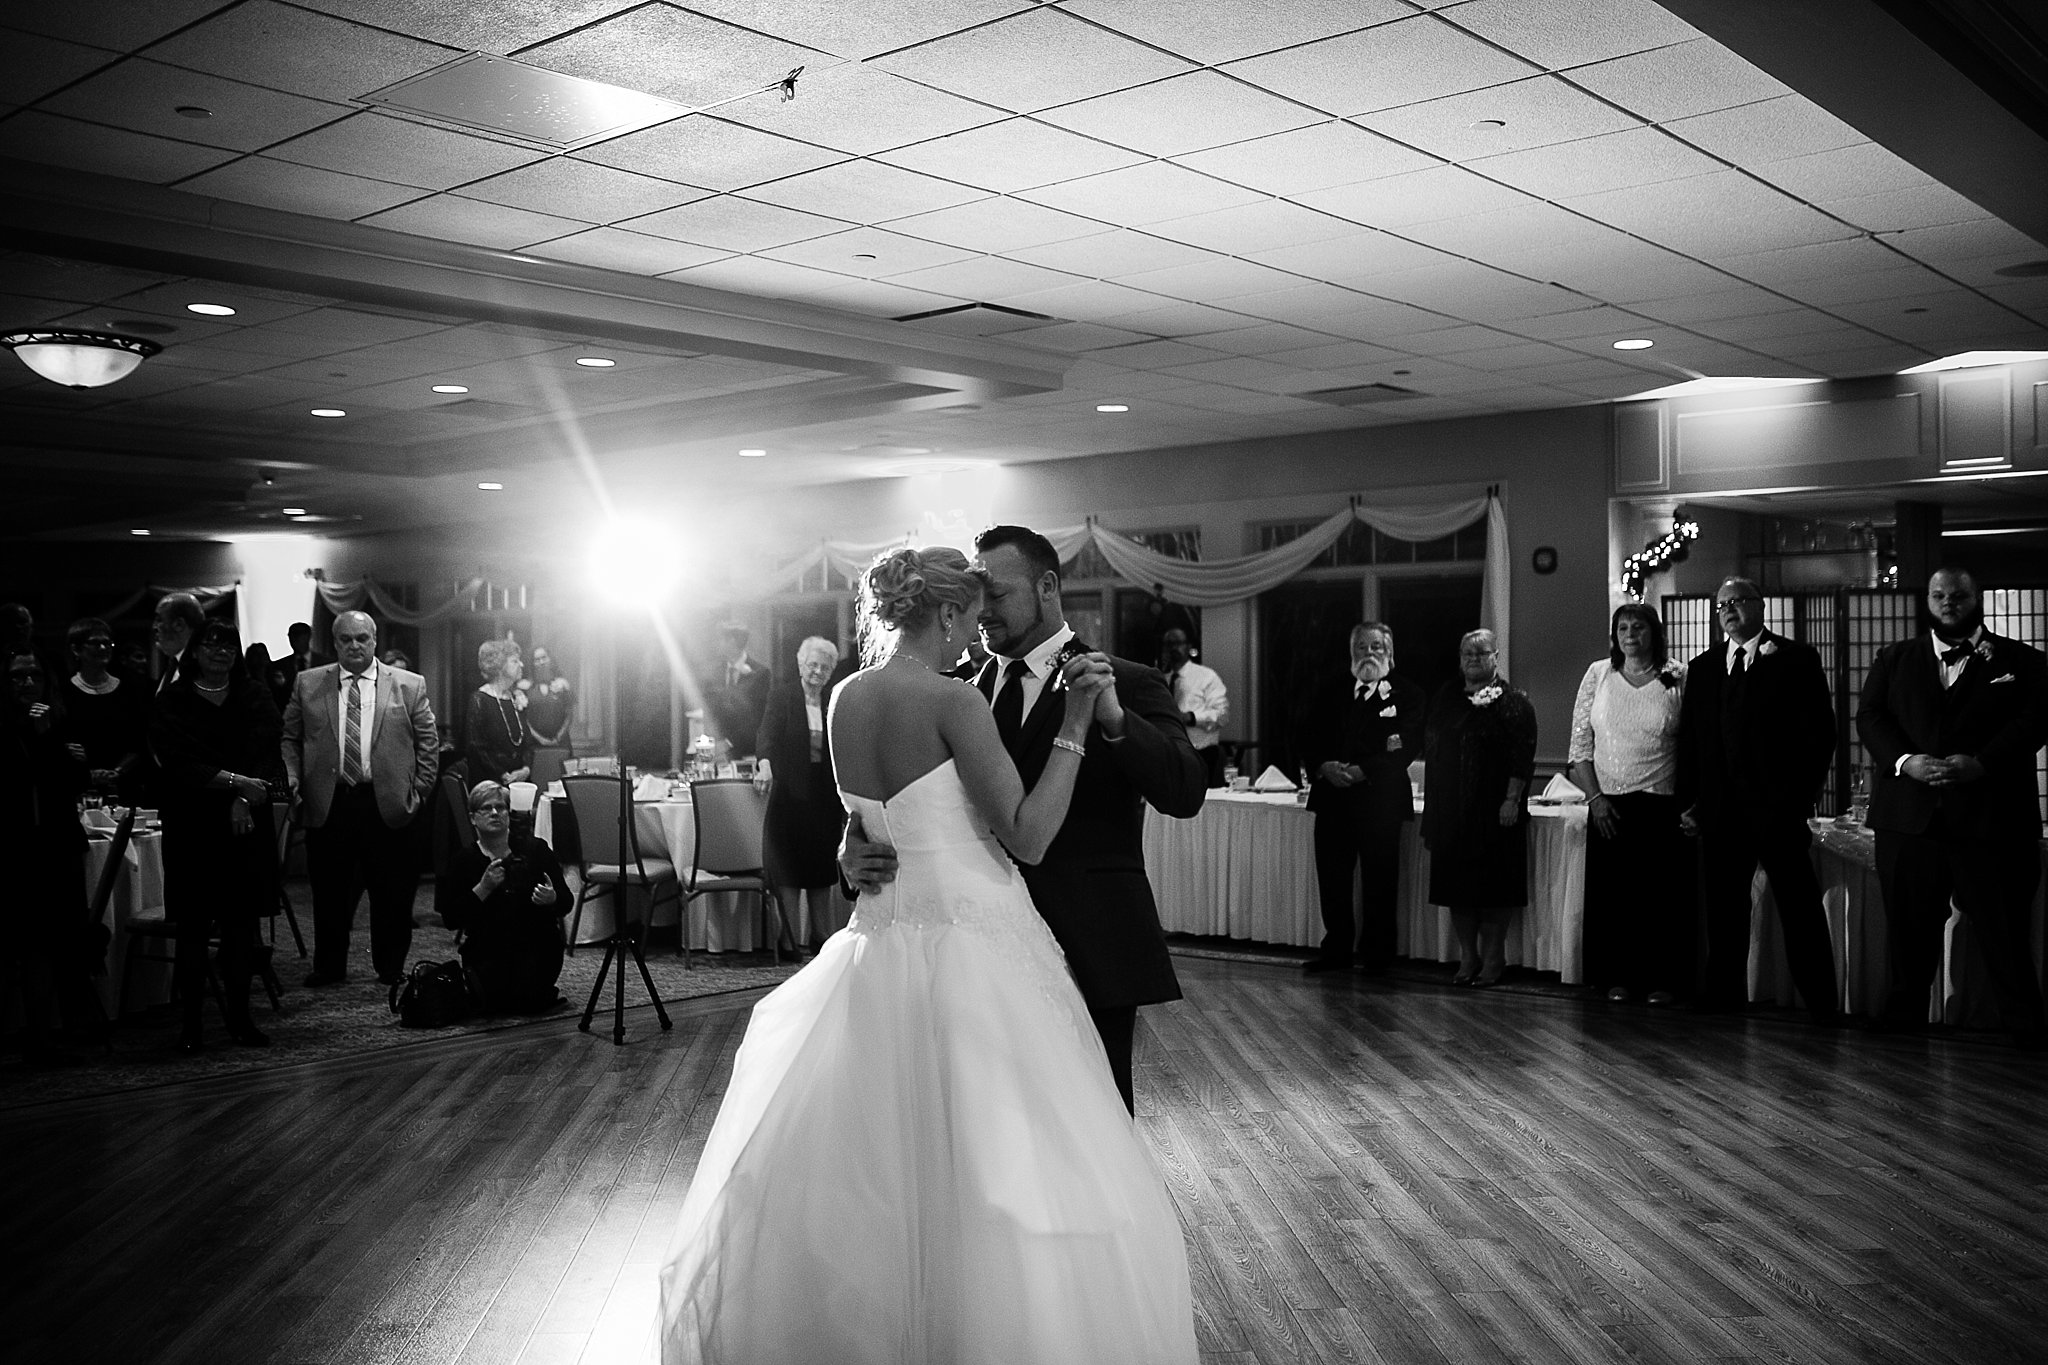 Wollaston Church of the Nazarene Wedding Boston Wedding Photographer62.jpg